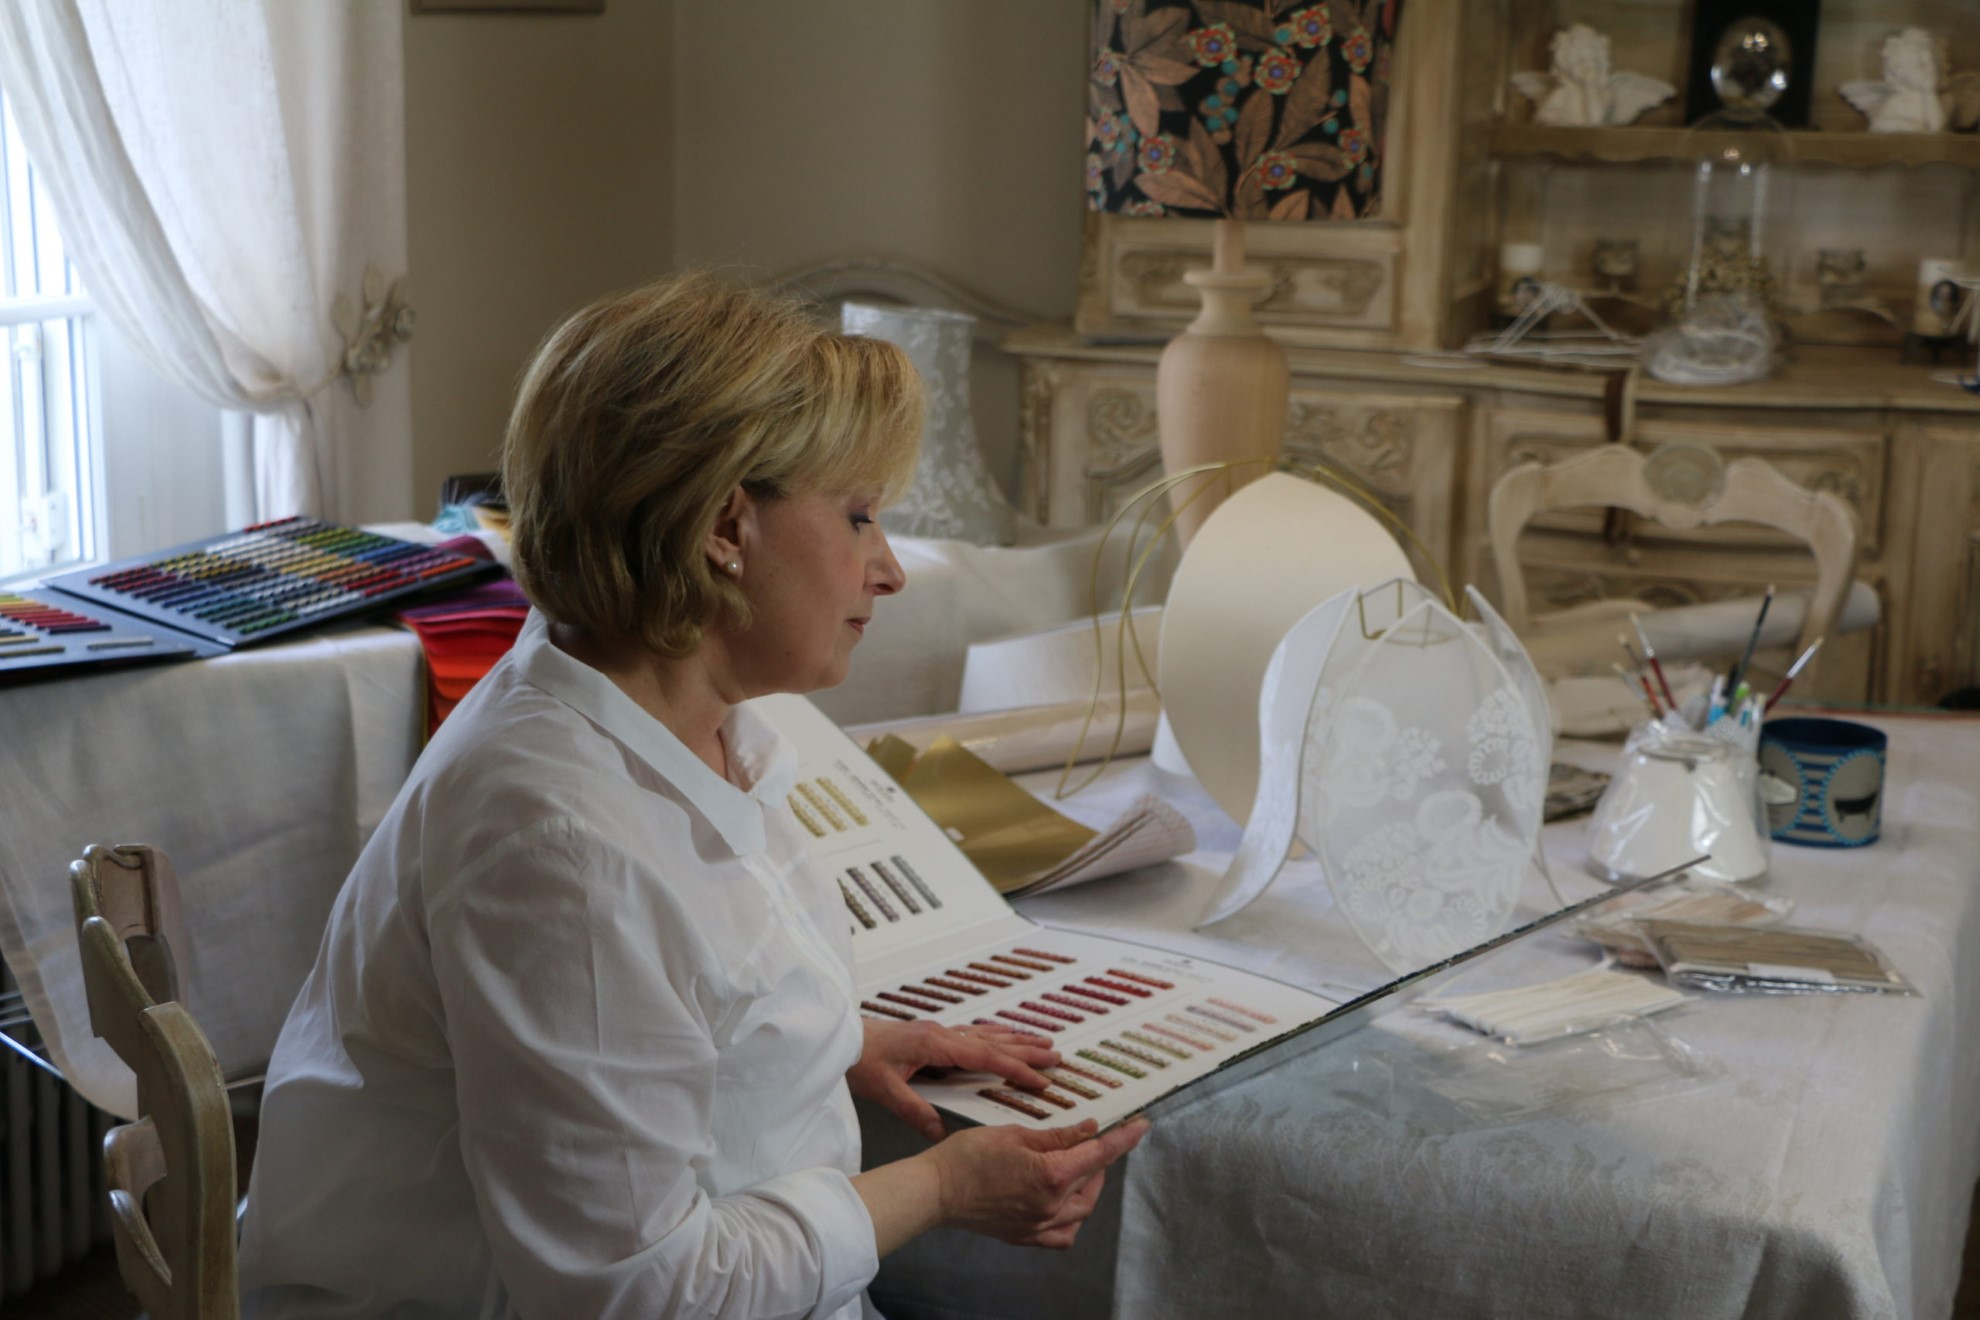 L'Atelier d'Apolline - Brigitte Lemasson Morigny Champigny (91)